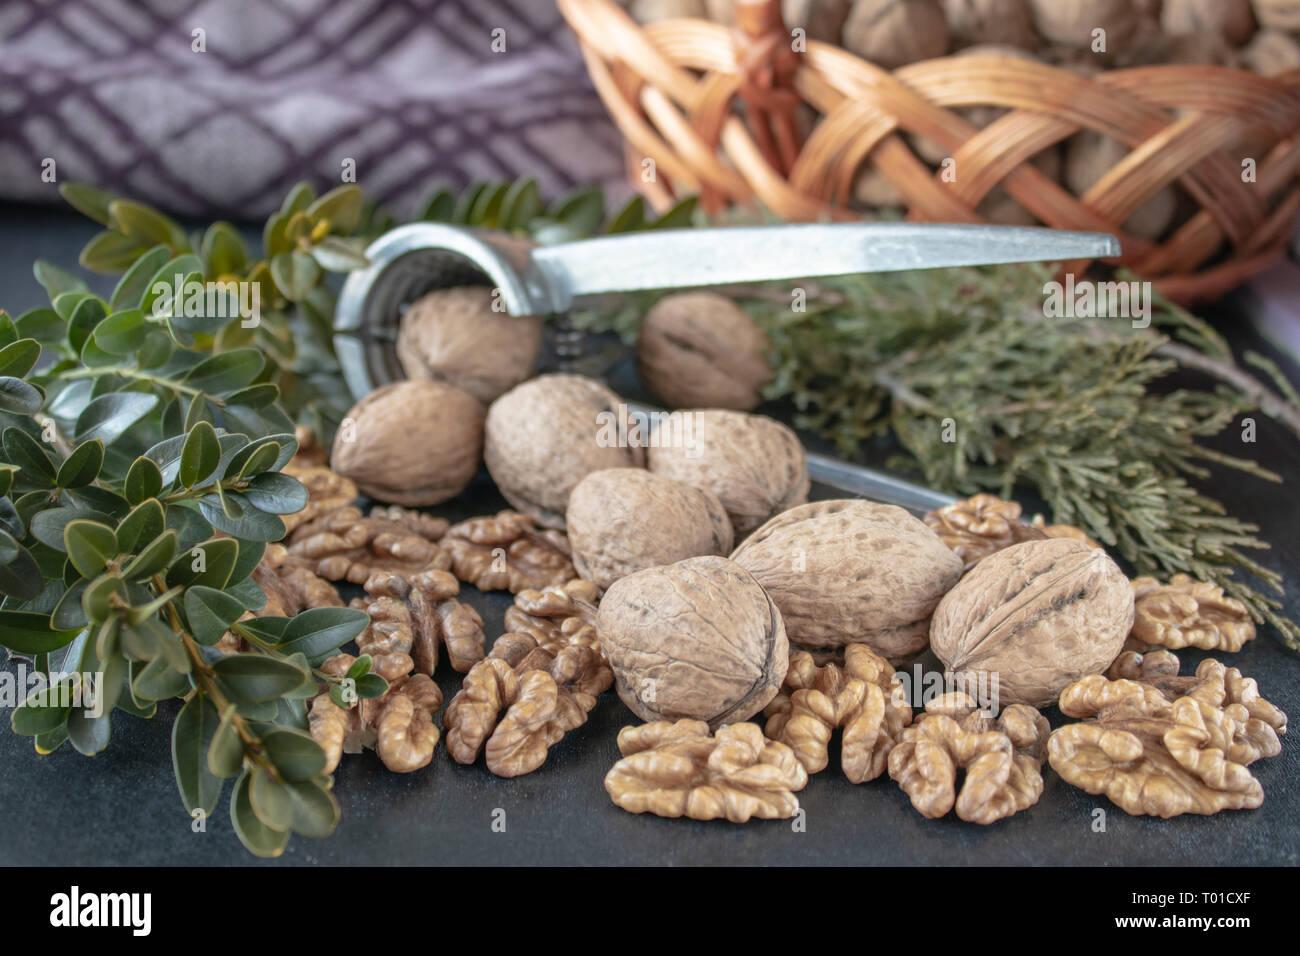 Walnuts on a black background, walnut kernels. Healthy food from walnut. Close-up. Stock Photo